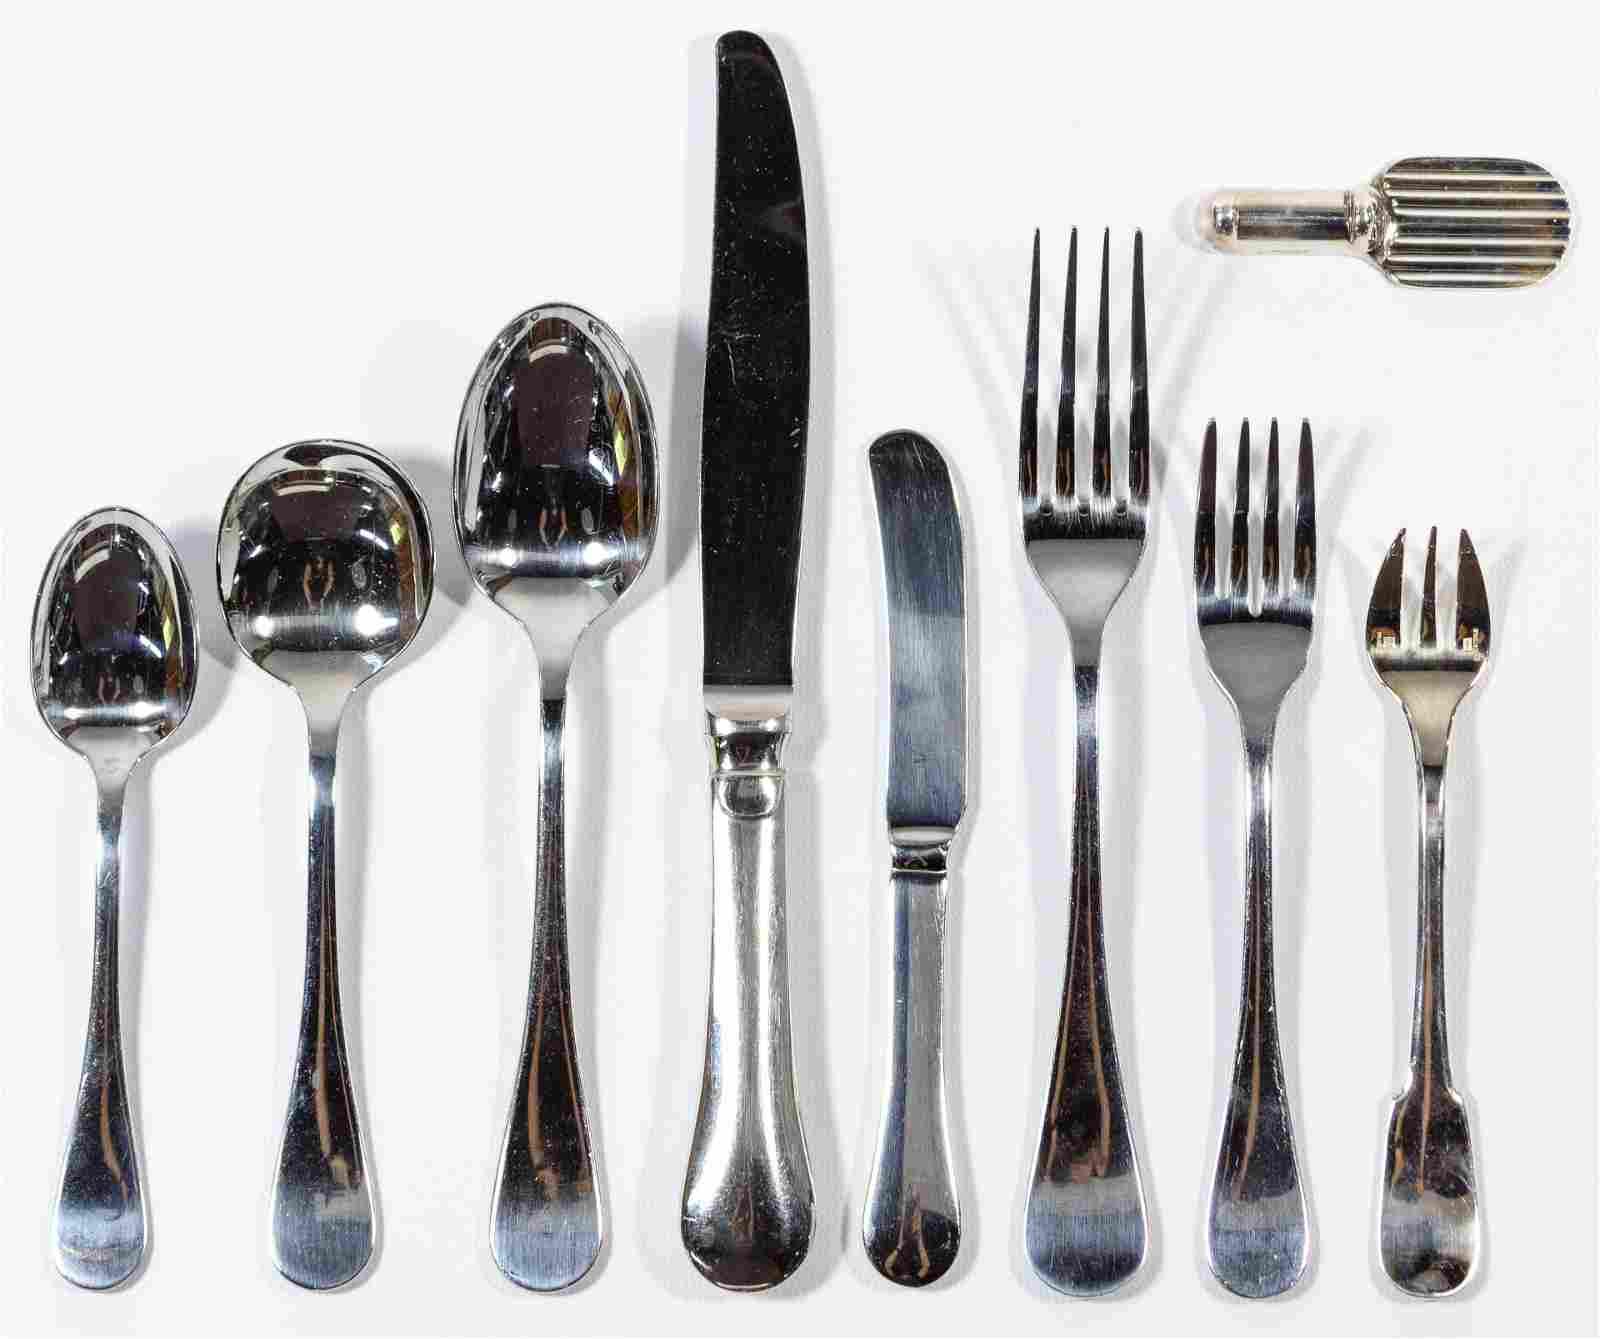 Christofle 'Berry' Stainless Steel Flatware Assortment